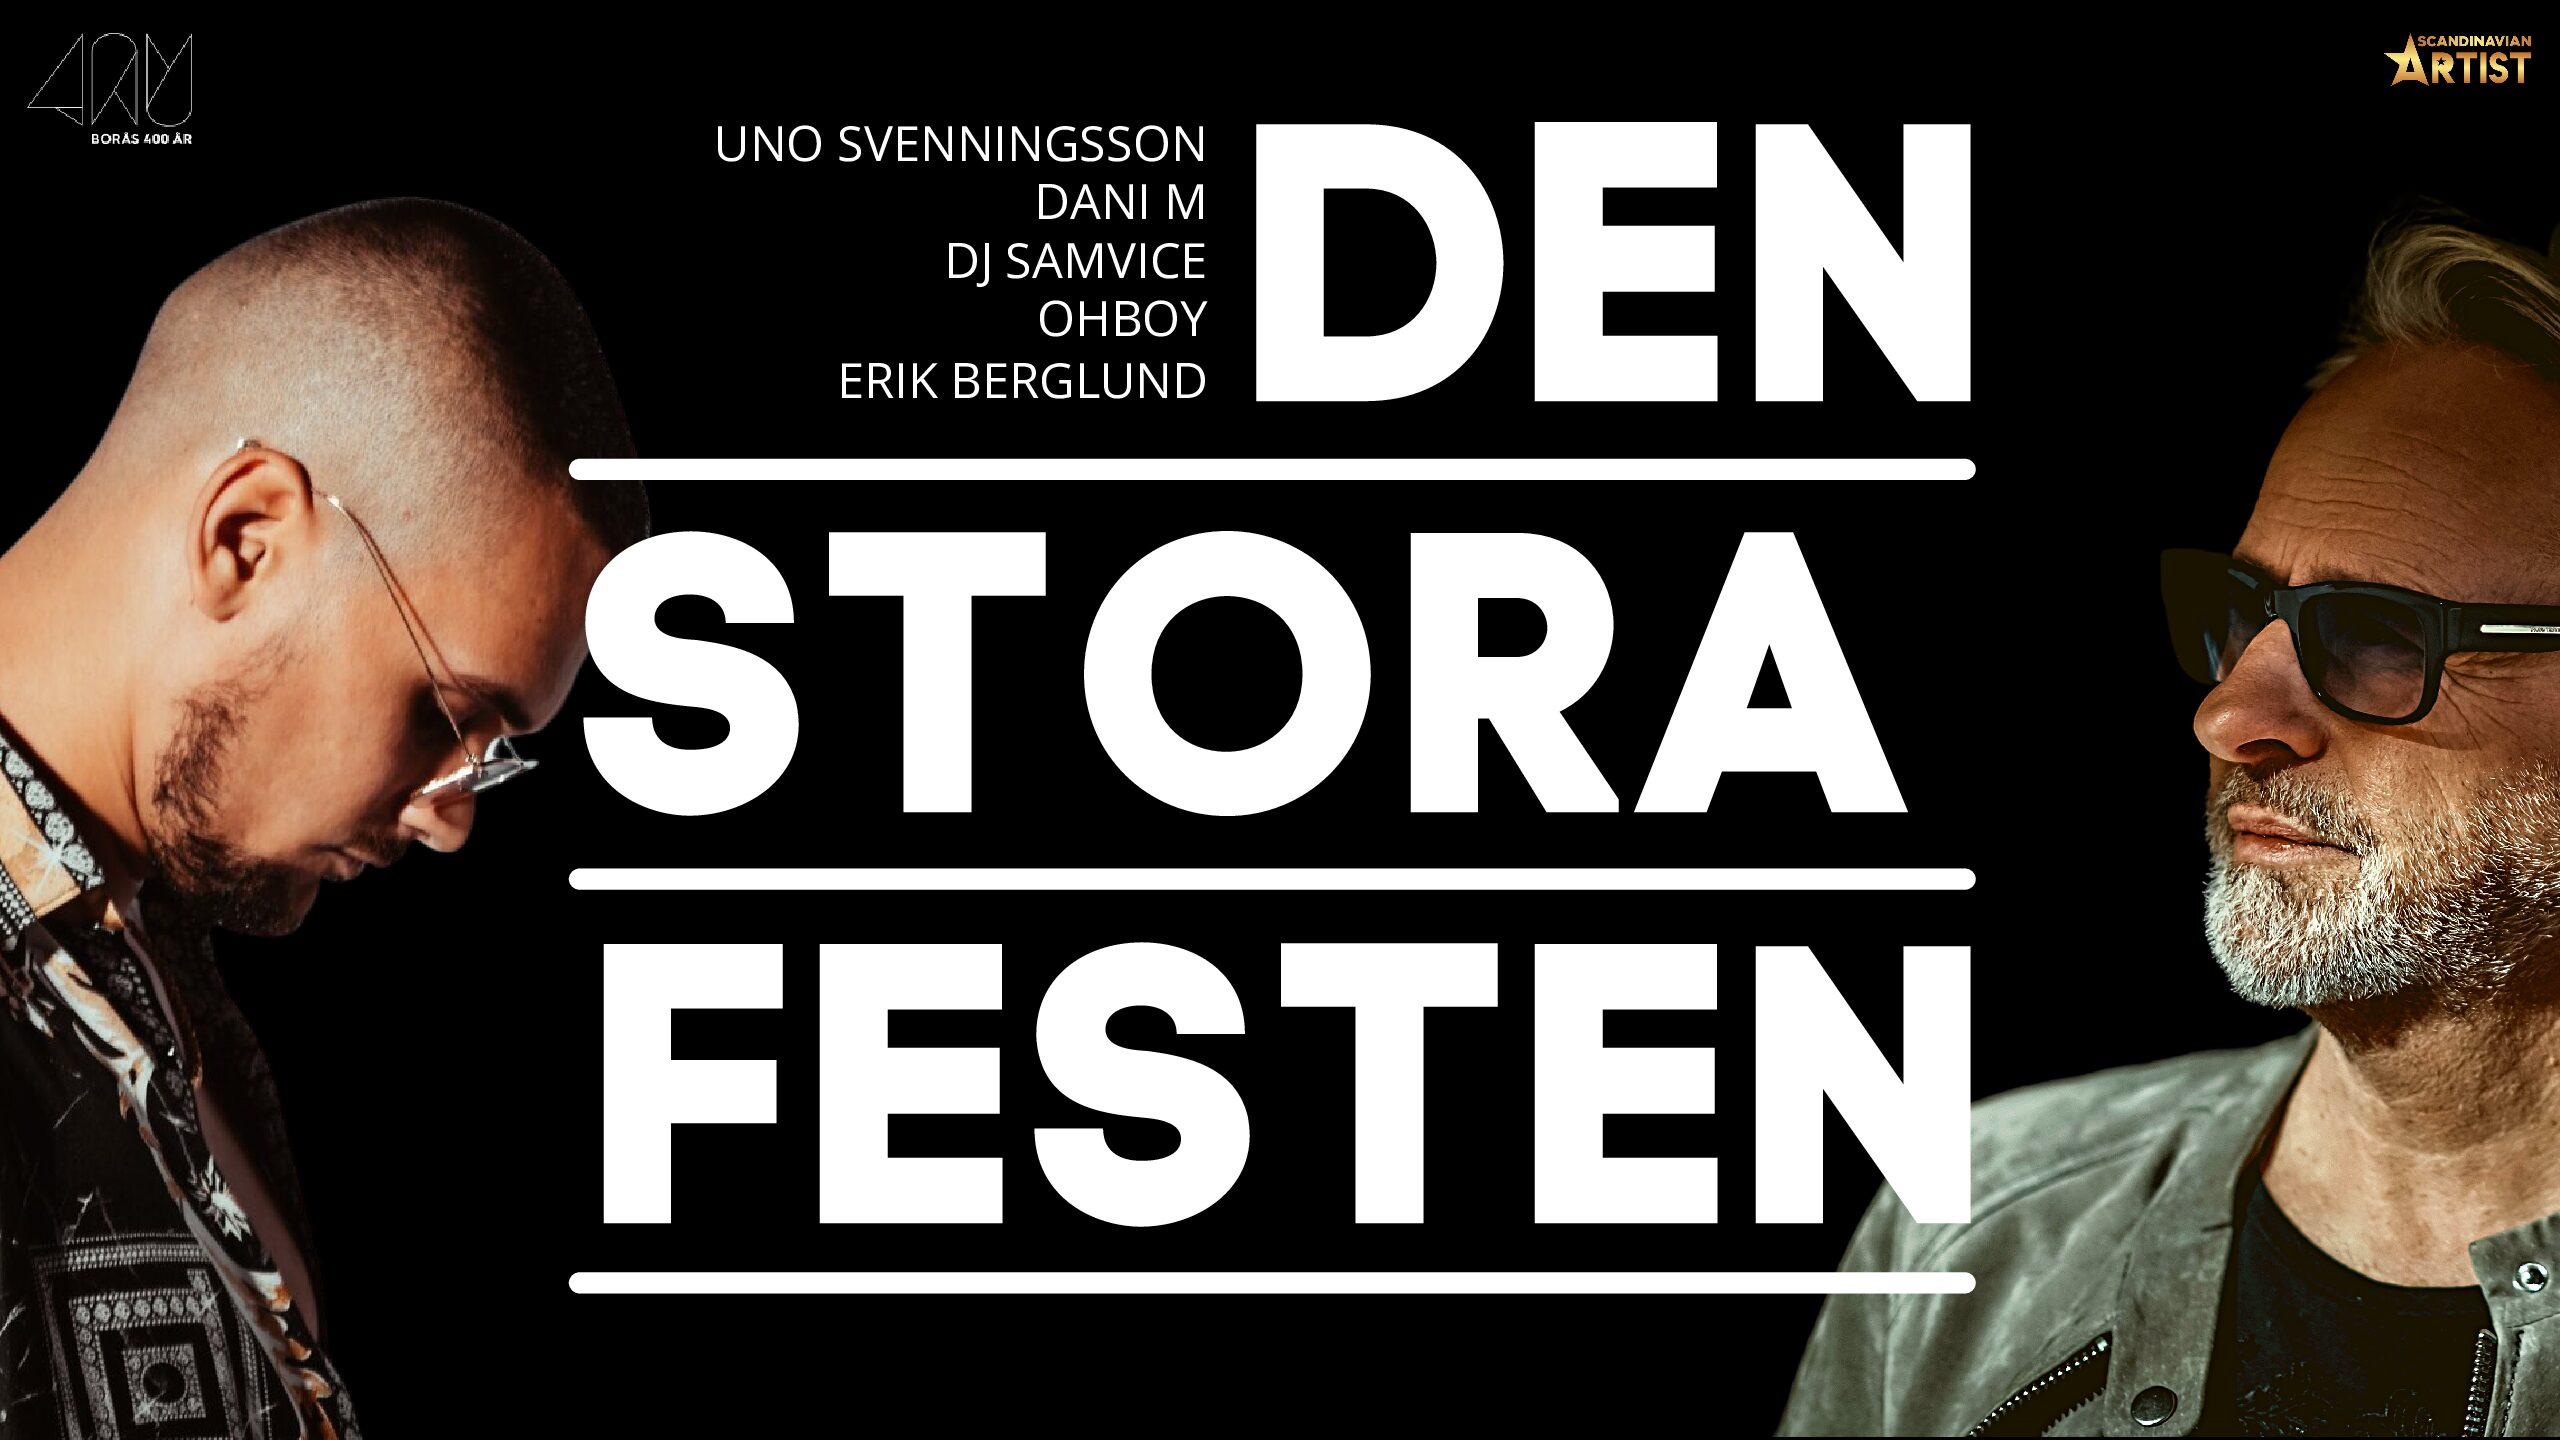 Den stora festen, Scandinavian Artist AB - Borås